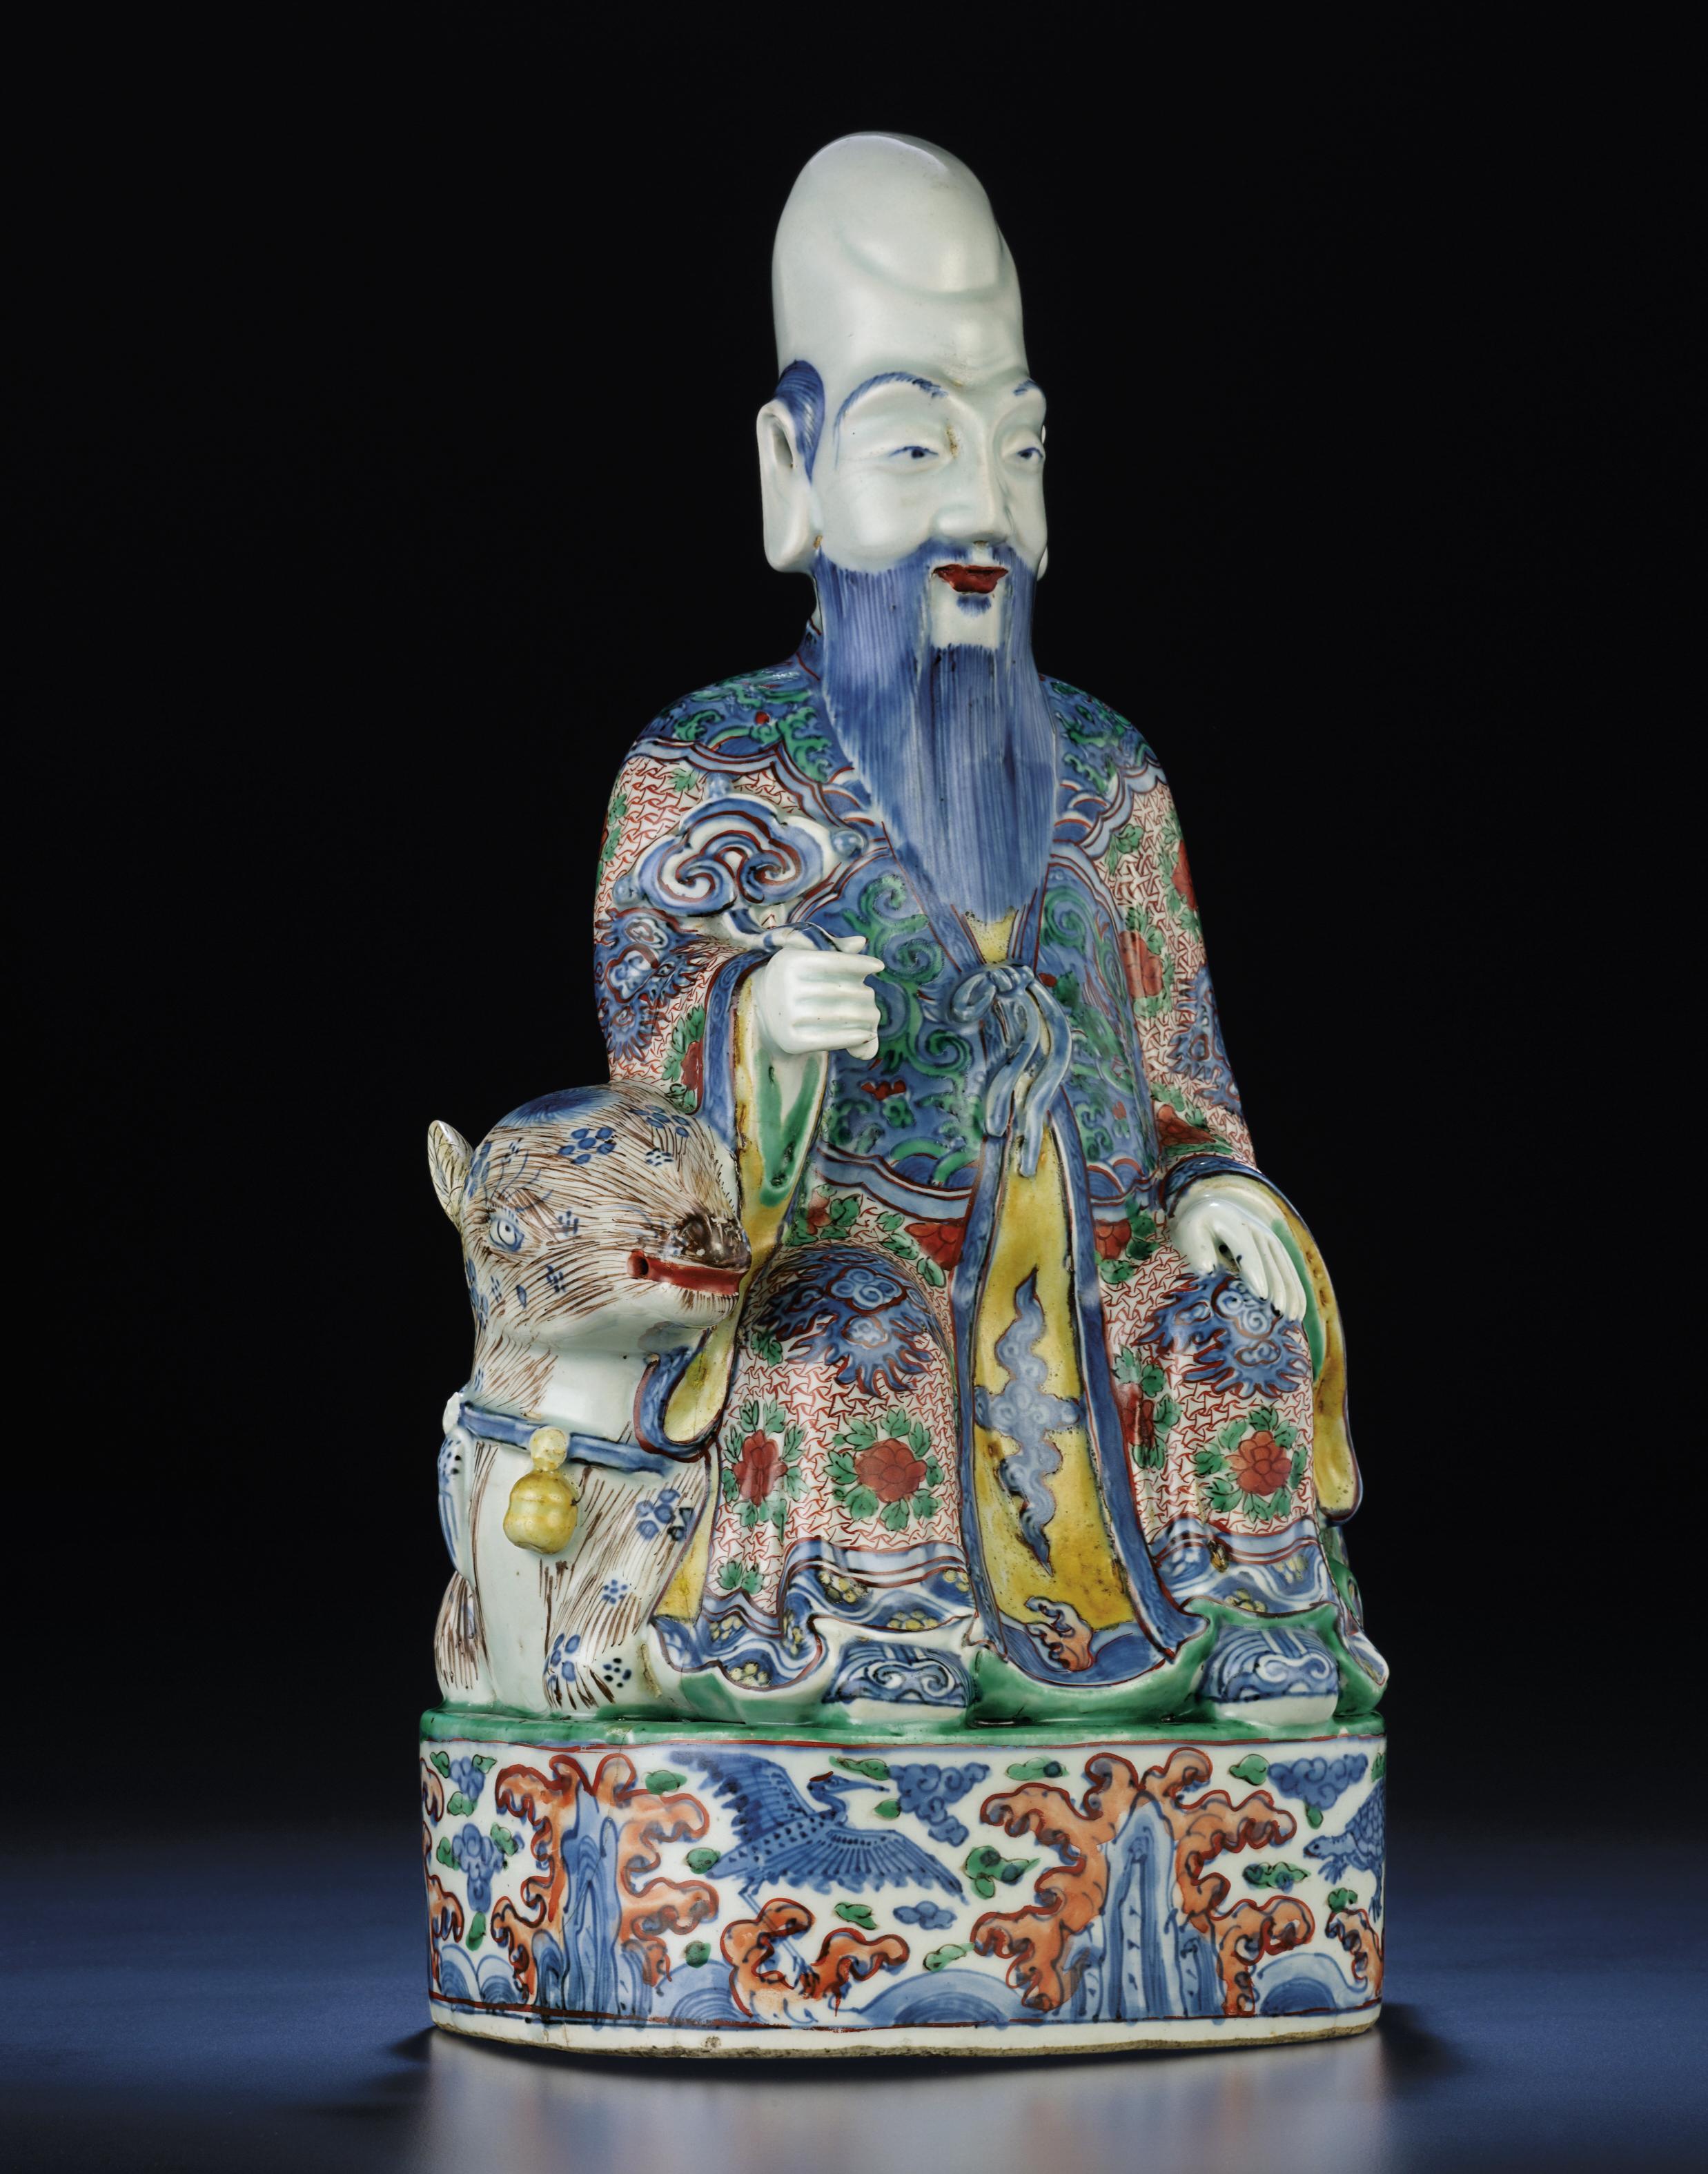 A LARGE AND RARE MING WUCAI SEATED FIGURE OF SHOULAO